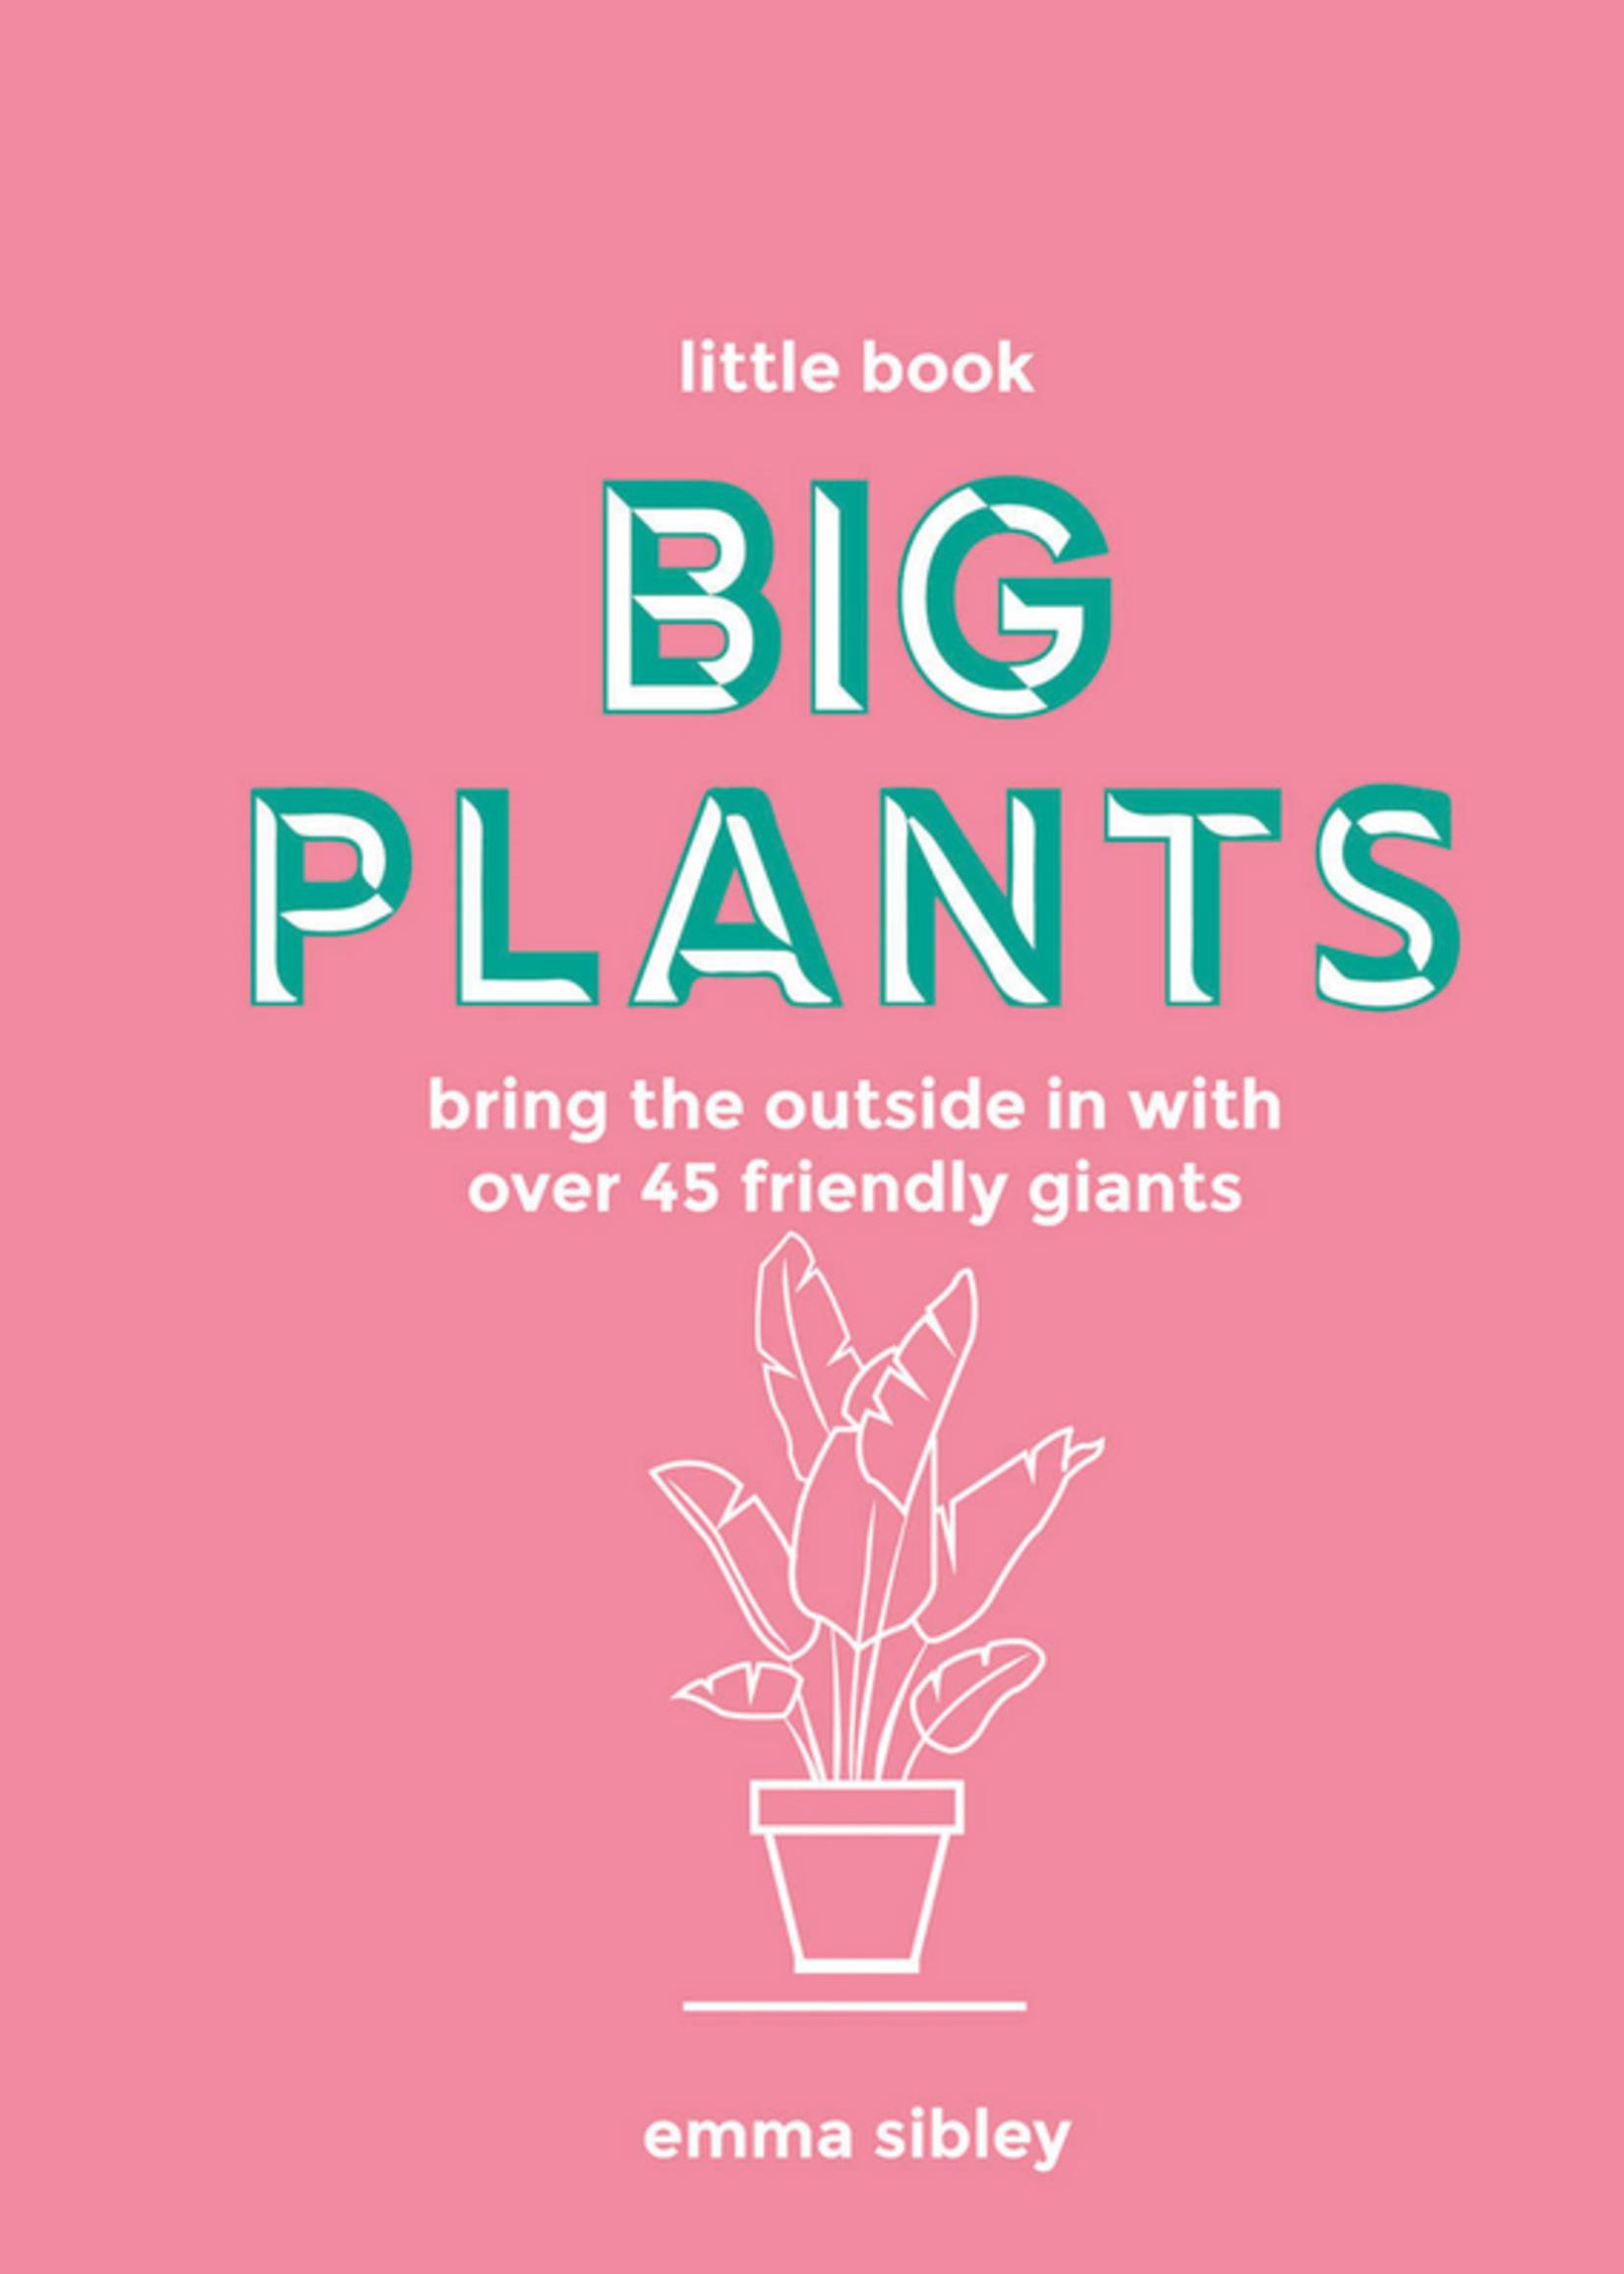 hachette book group hachette big plant book